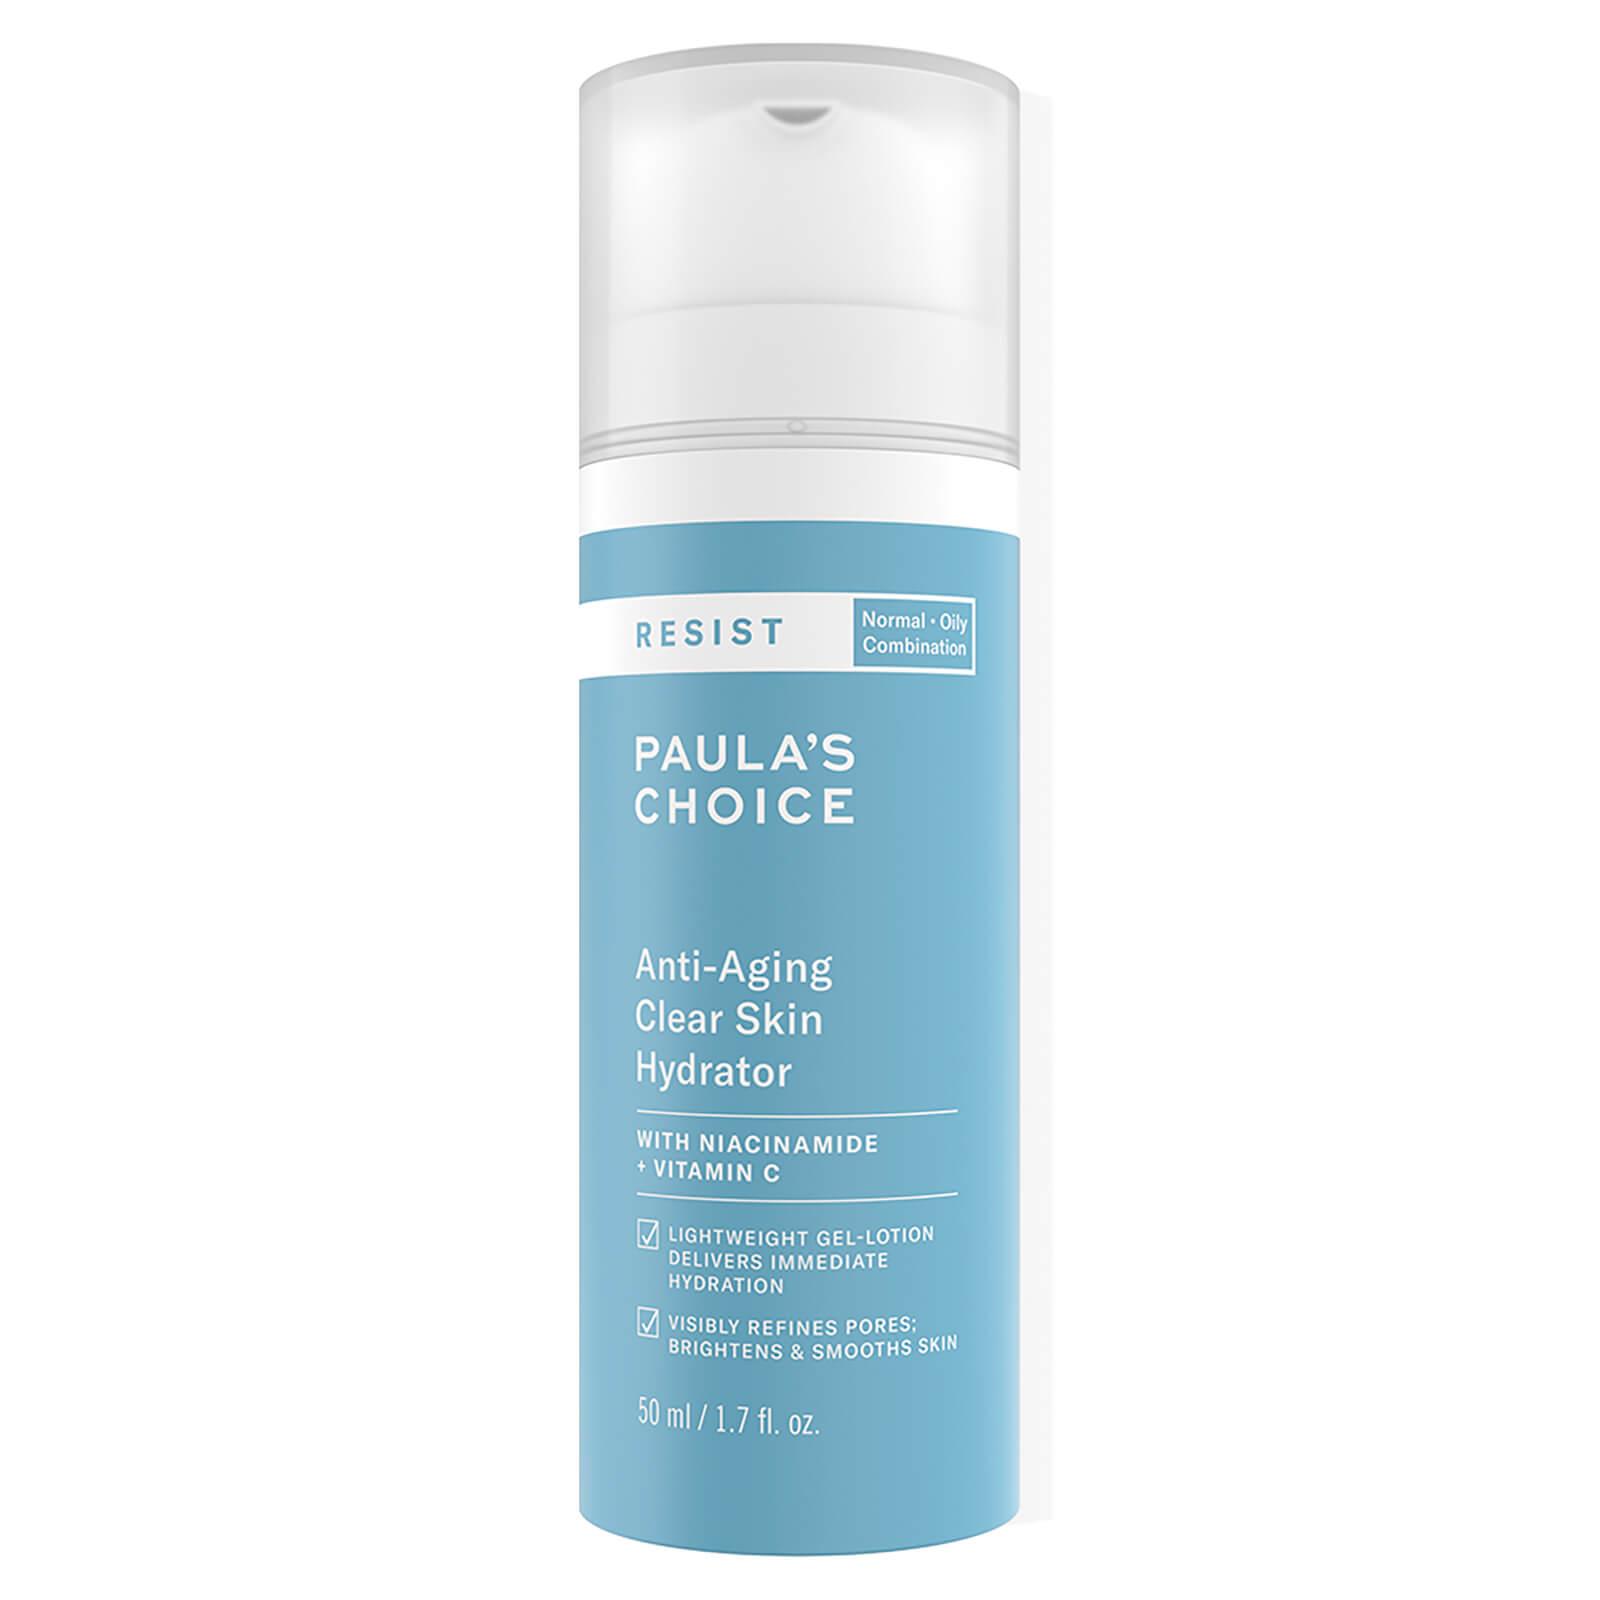 Paula's Choice Resist Anti-ageing Clear Skin Hydrator (50ml)